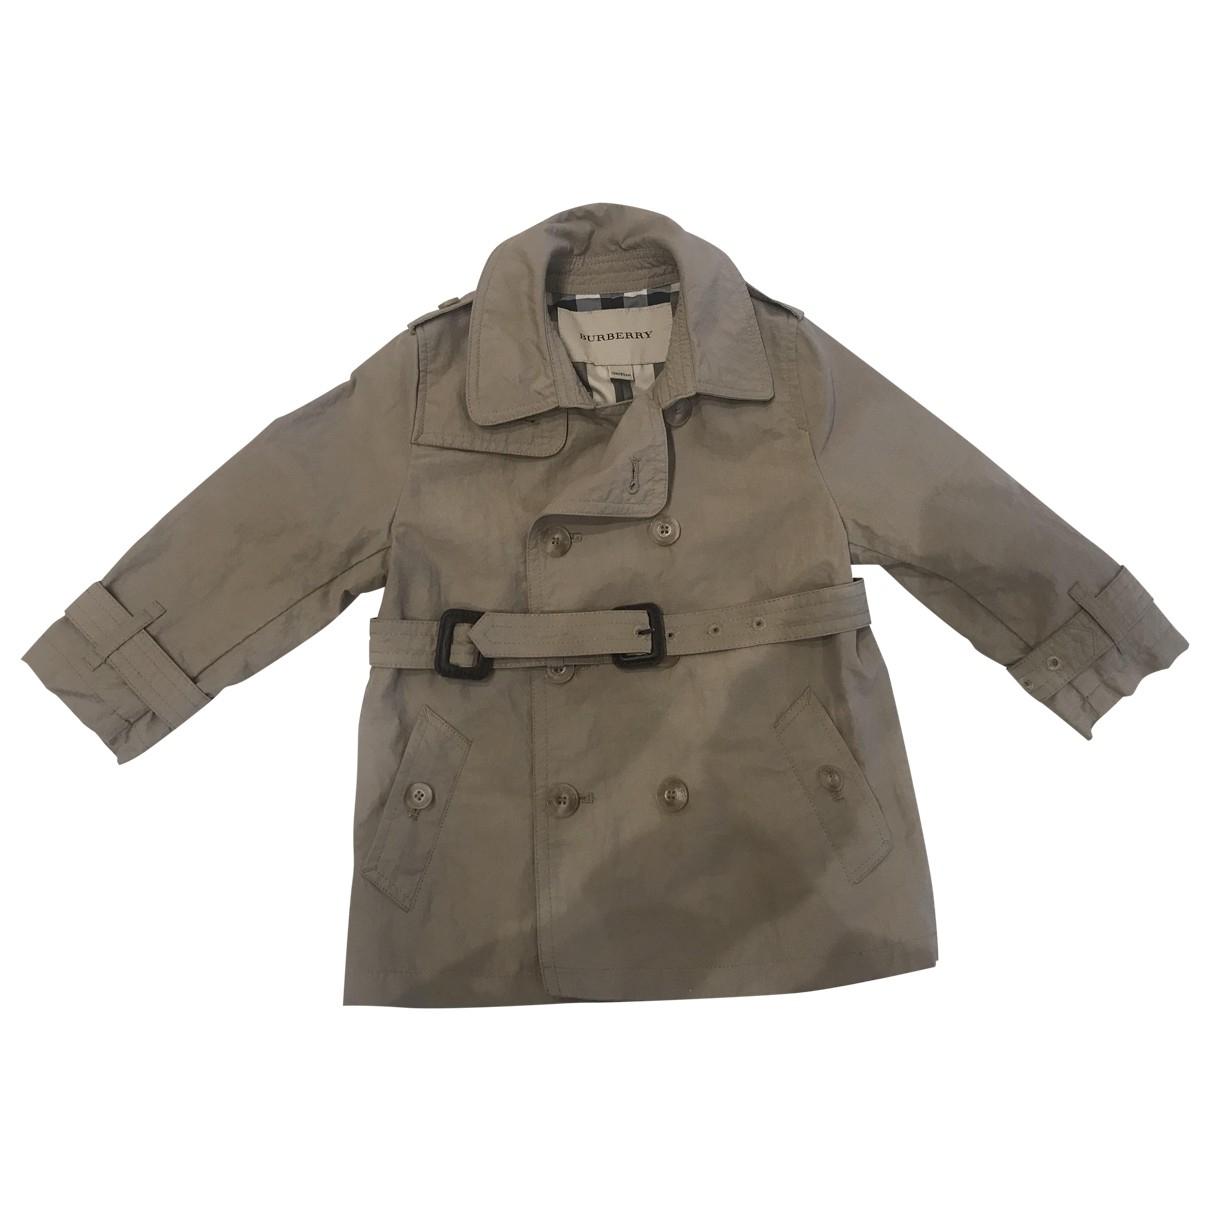 Burberry \N Beige Cotton jacket & coat for Kids 18 months - up to 81cm FR